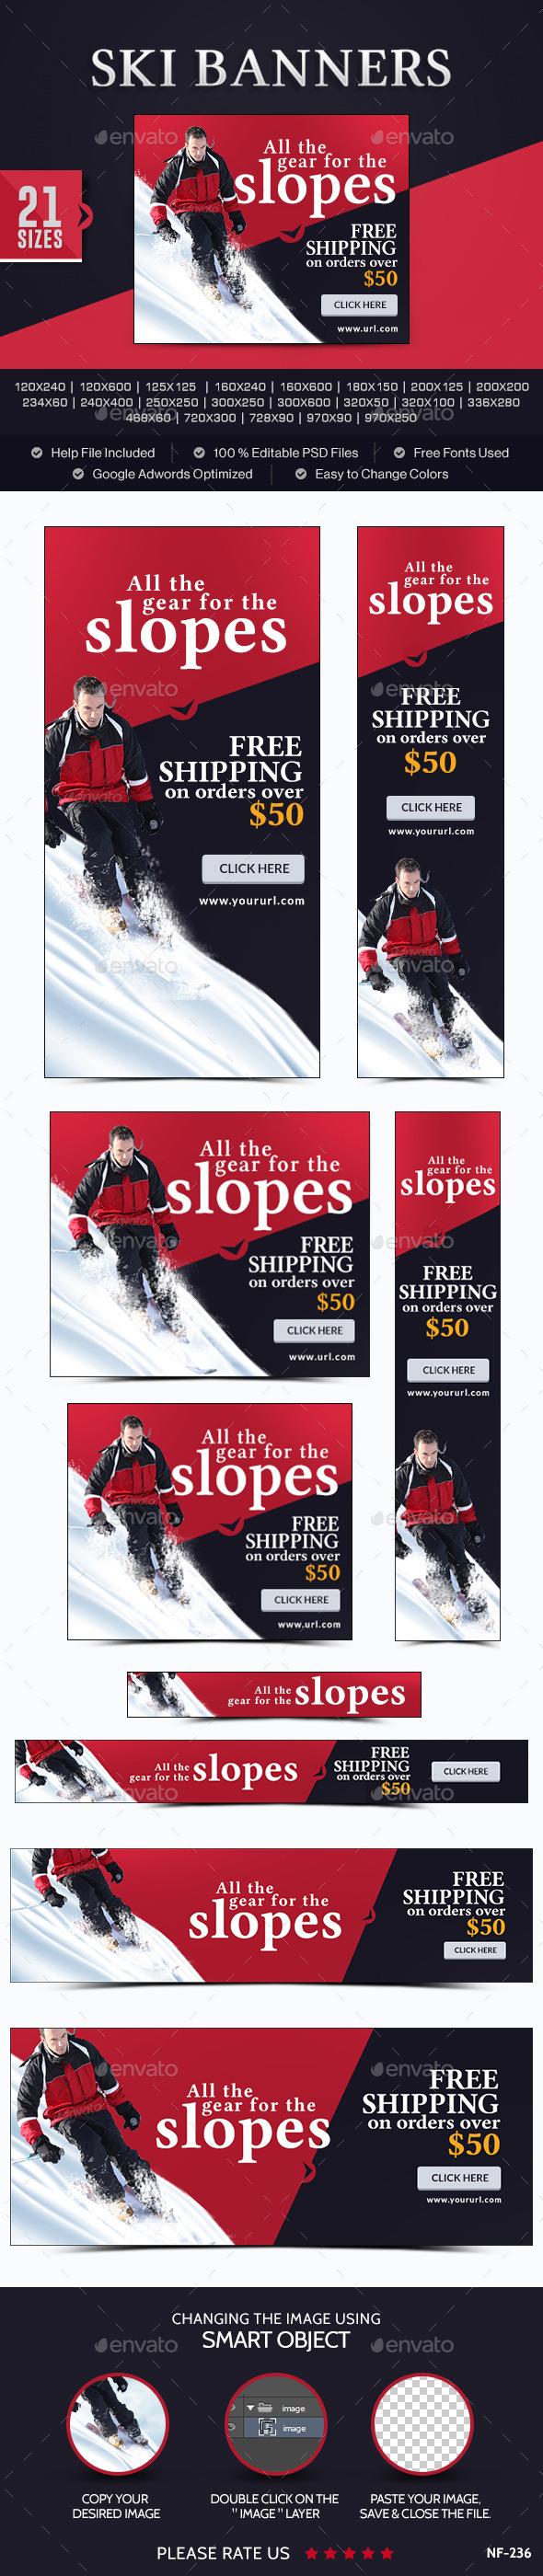 Ski Banners